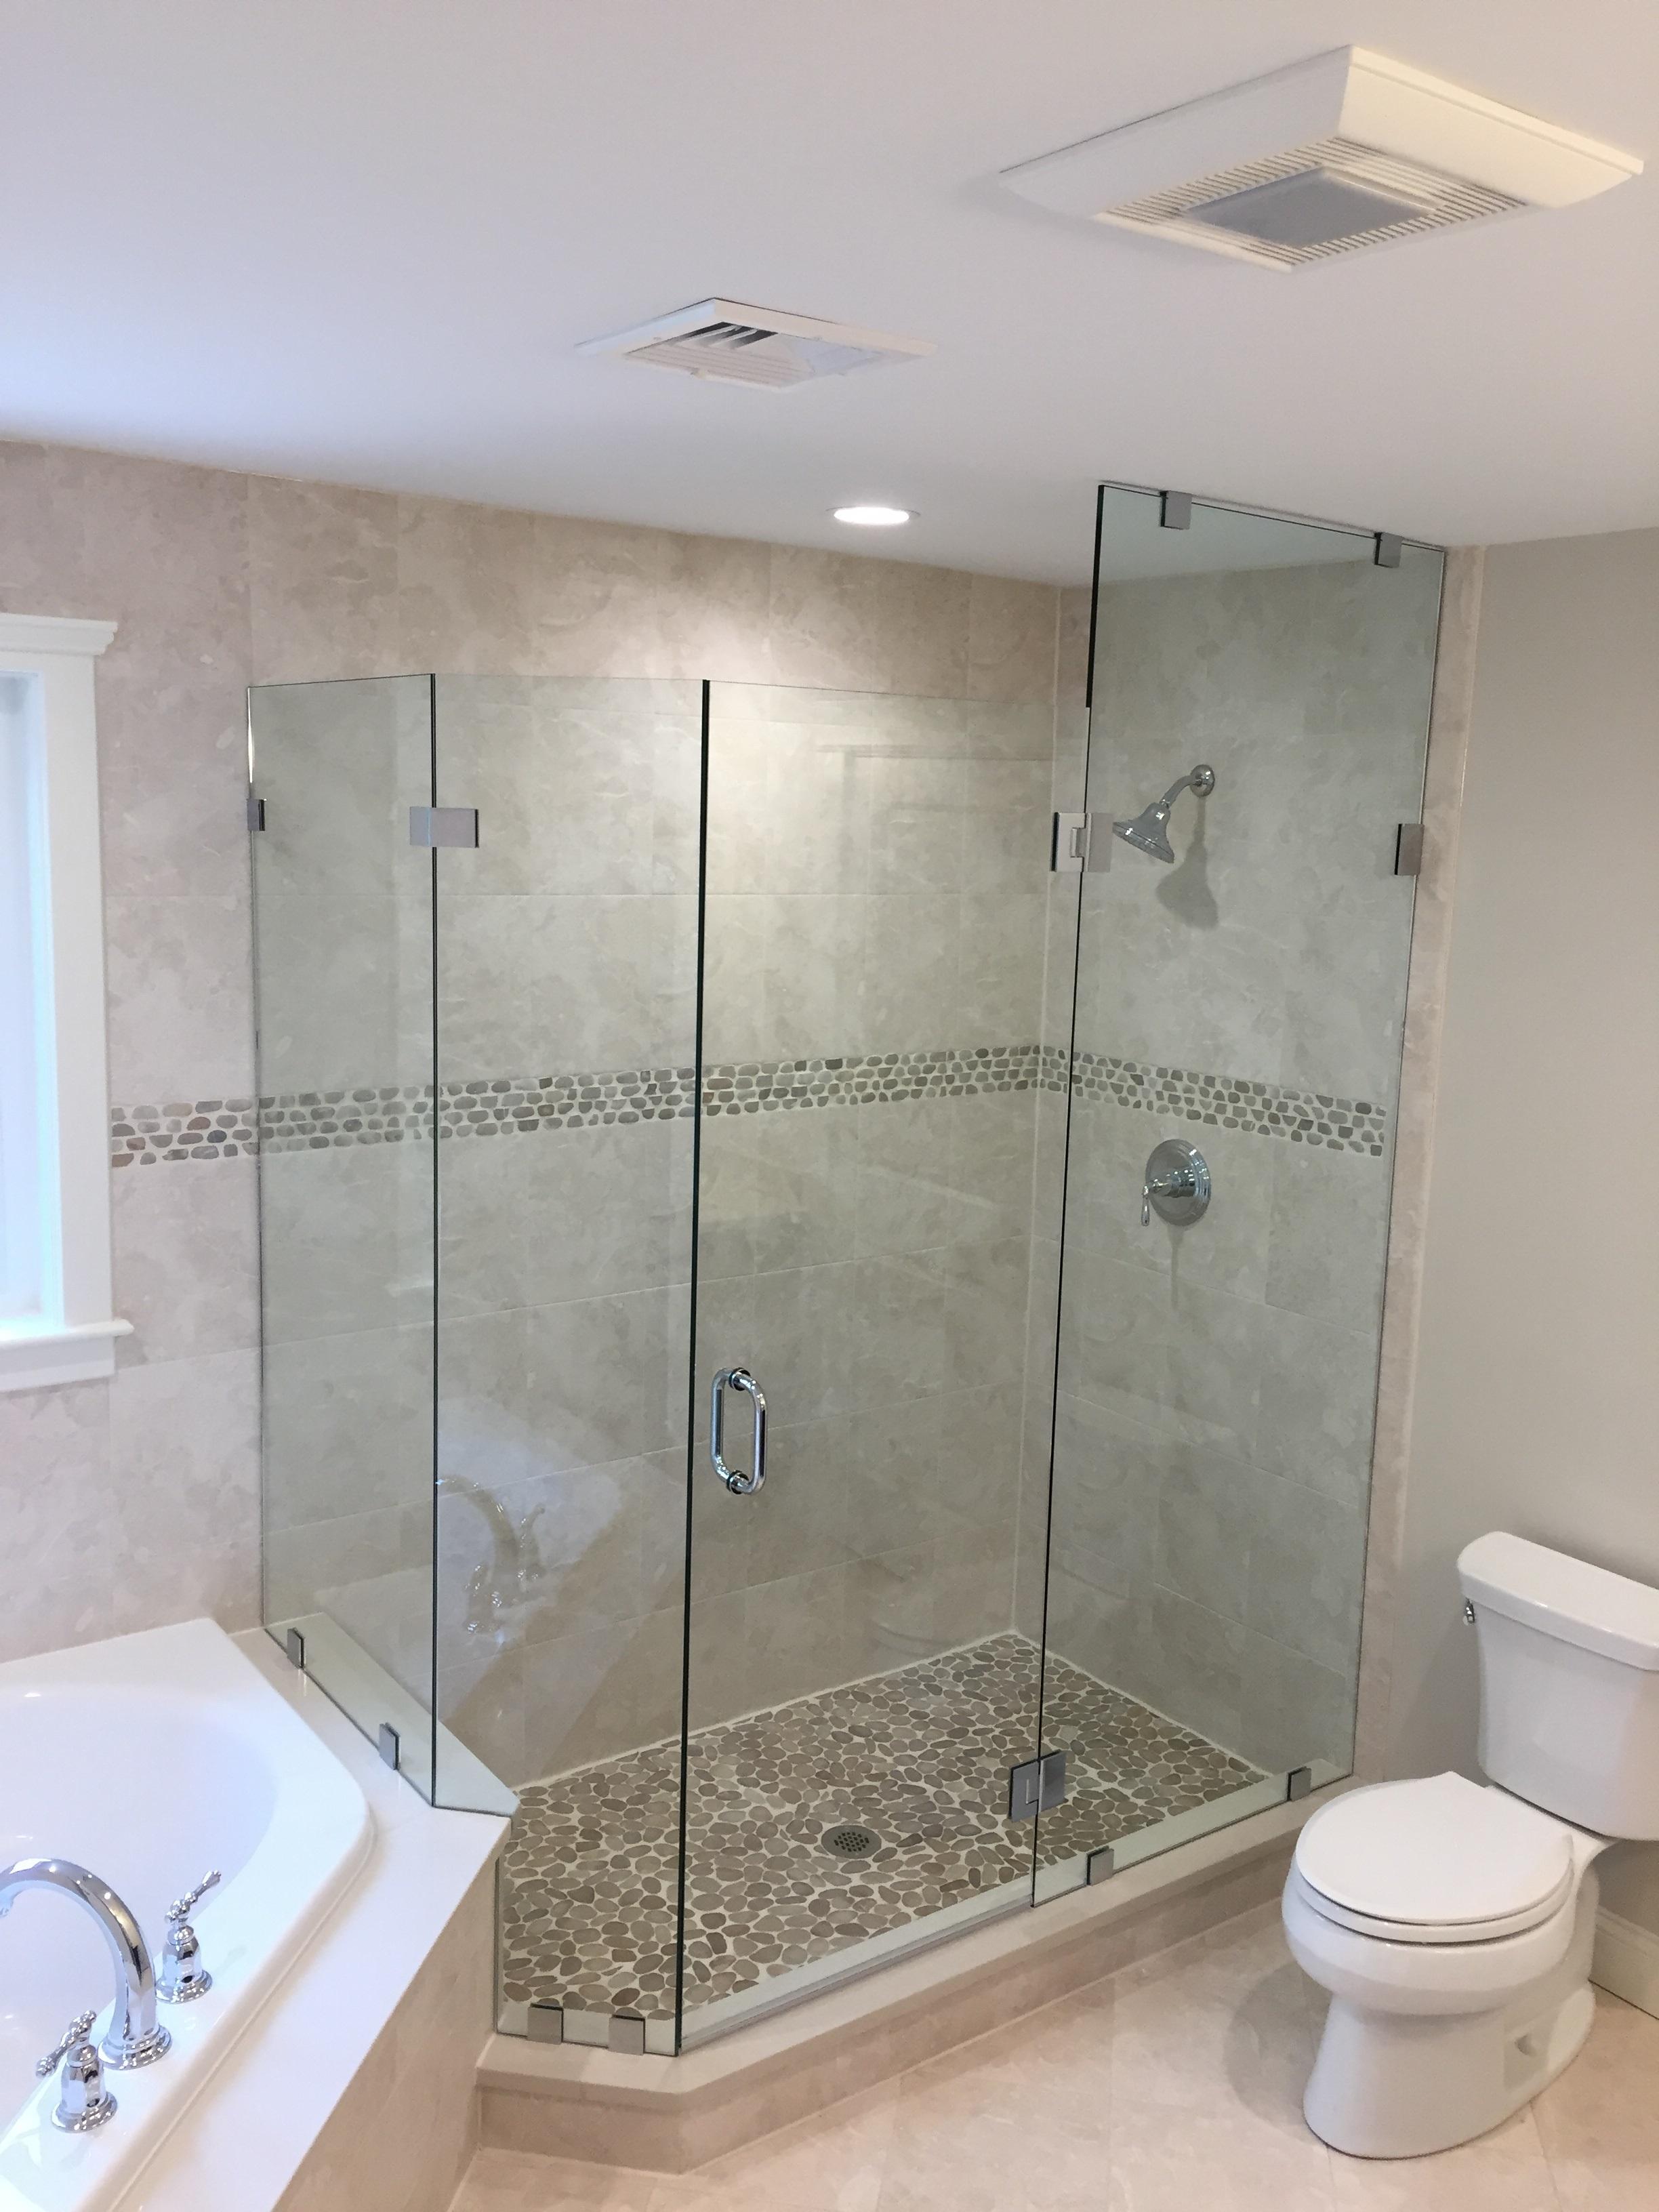 SDT 14 Custom Shower Design Franklin Glass pany